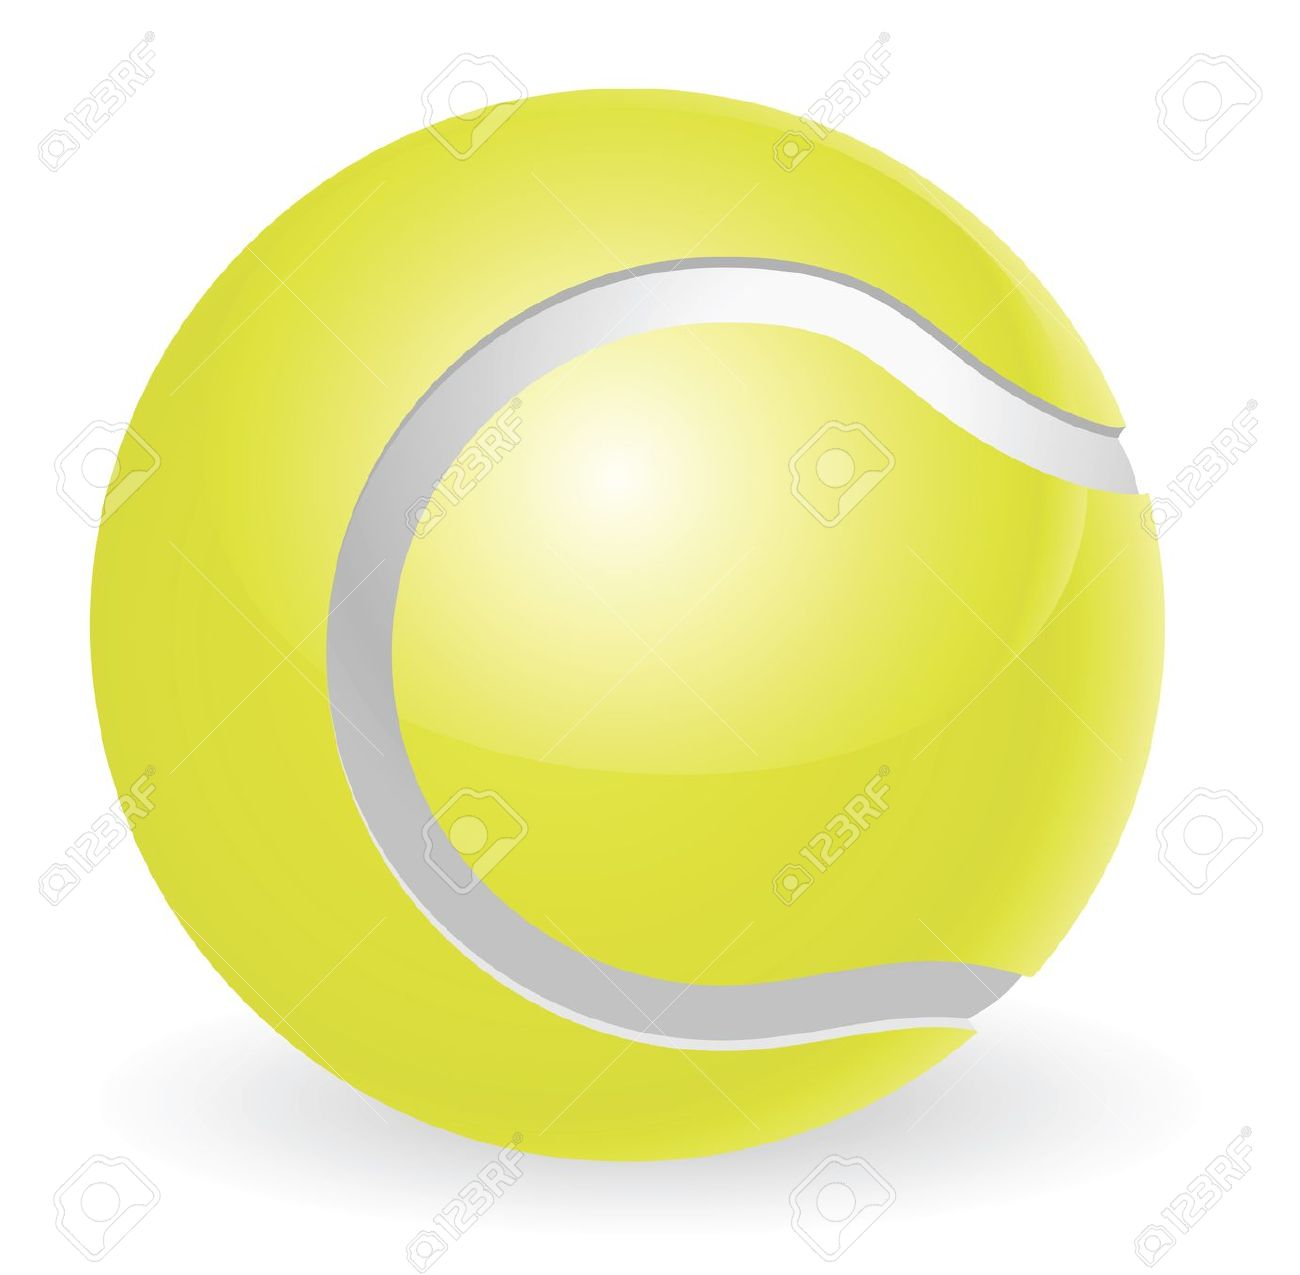 1300x1275 Tennis Ball Clipart Cartoon